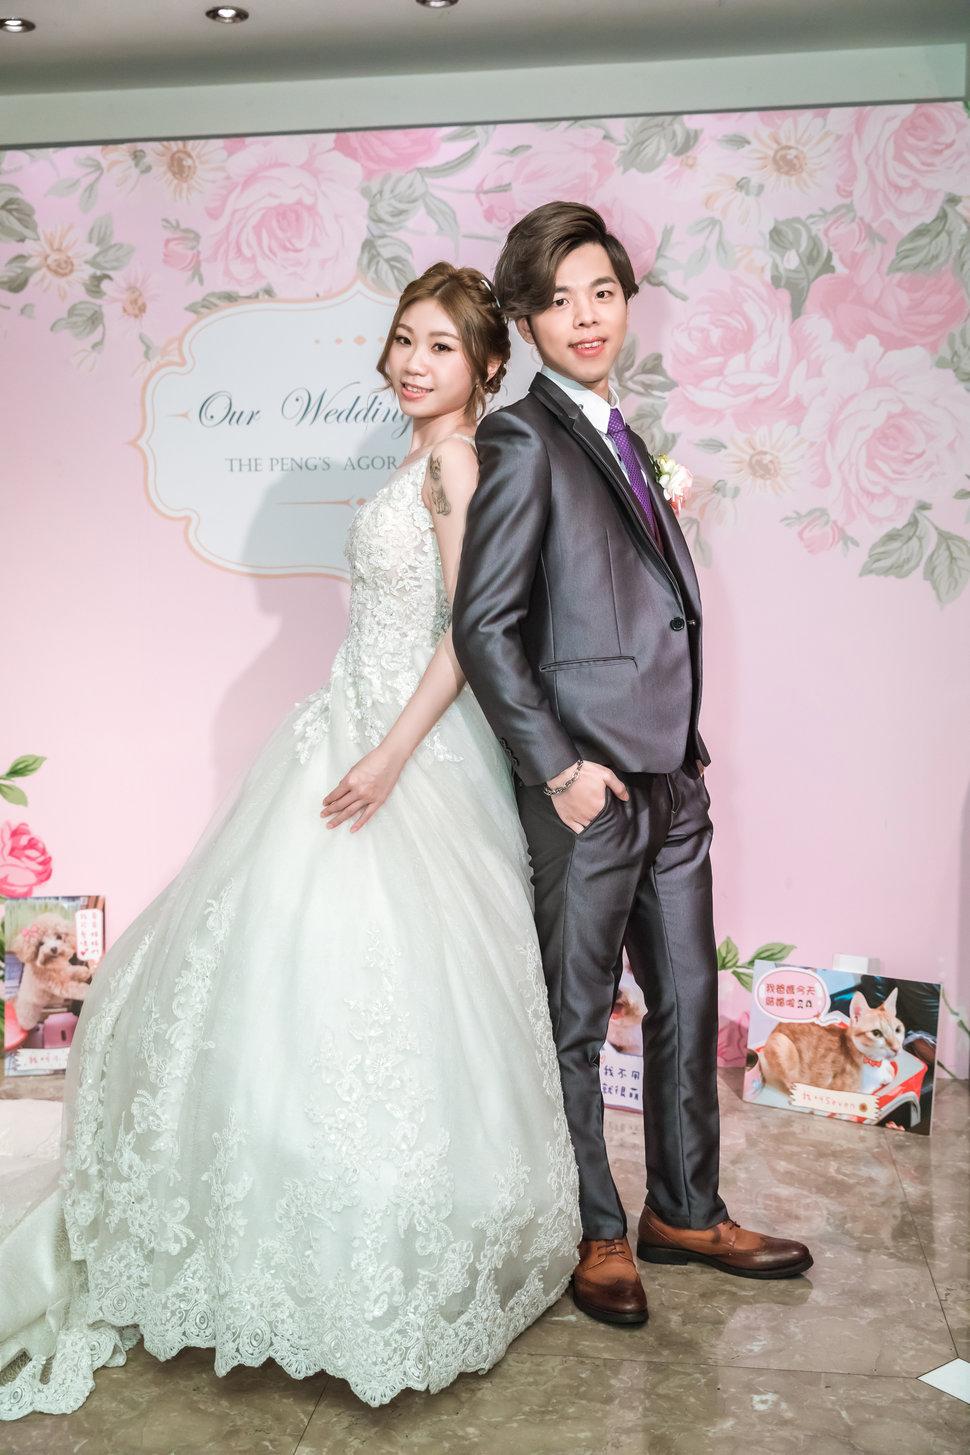 5D4_3710 - Promaker婚禮紀錄攝影團隊婚攝豪哥《結婚吧》